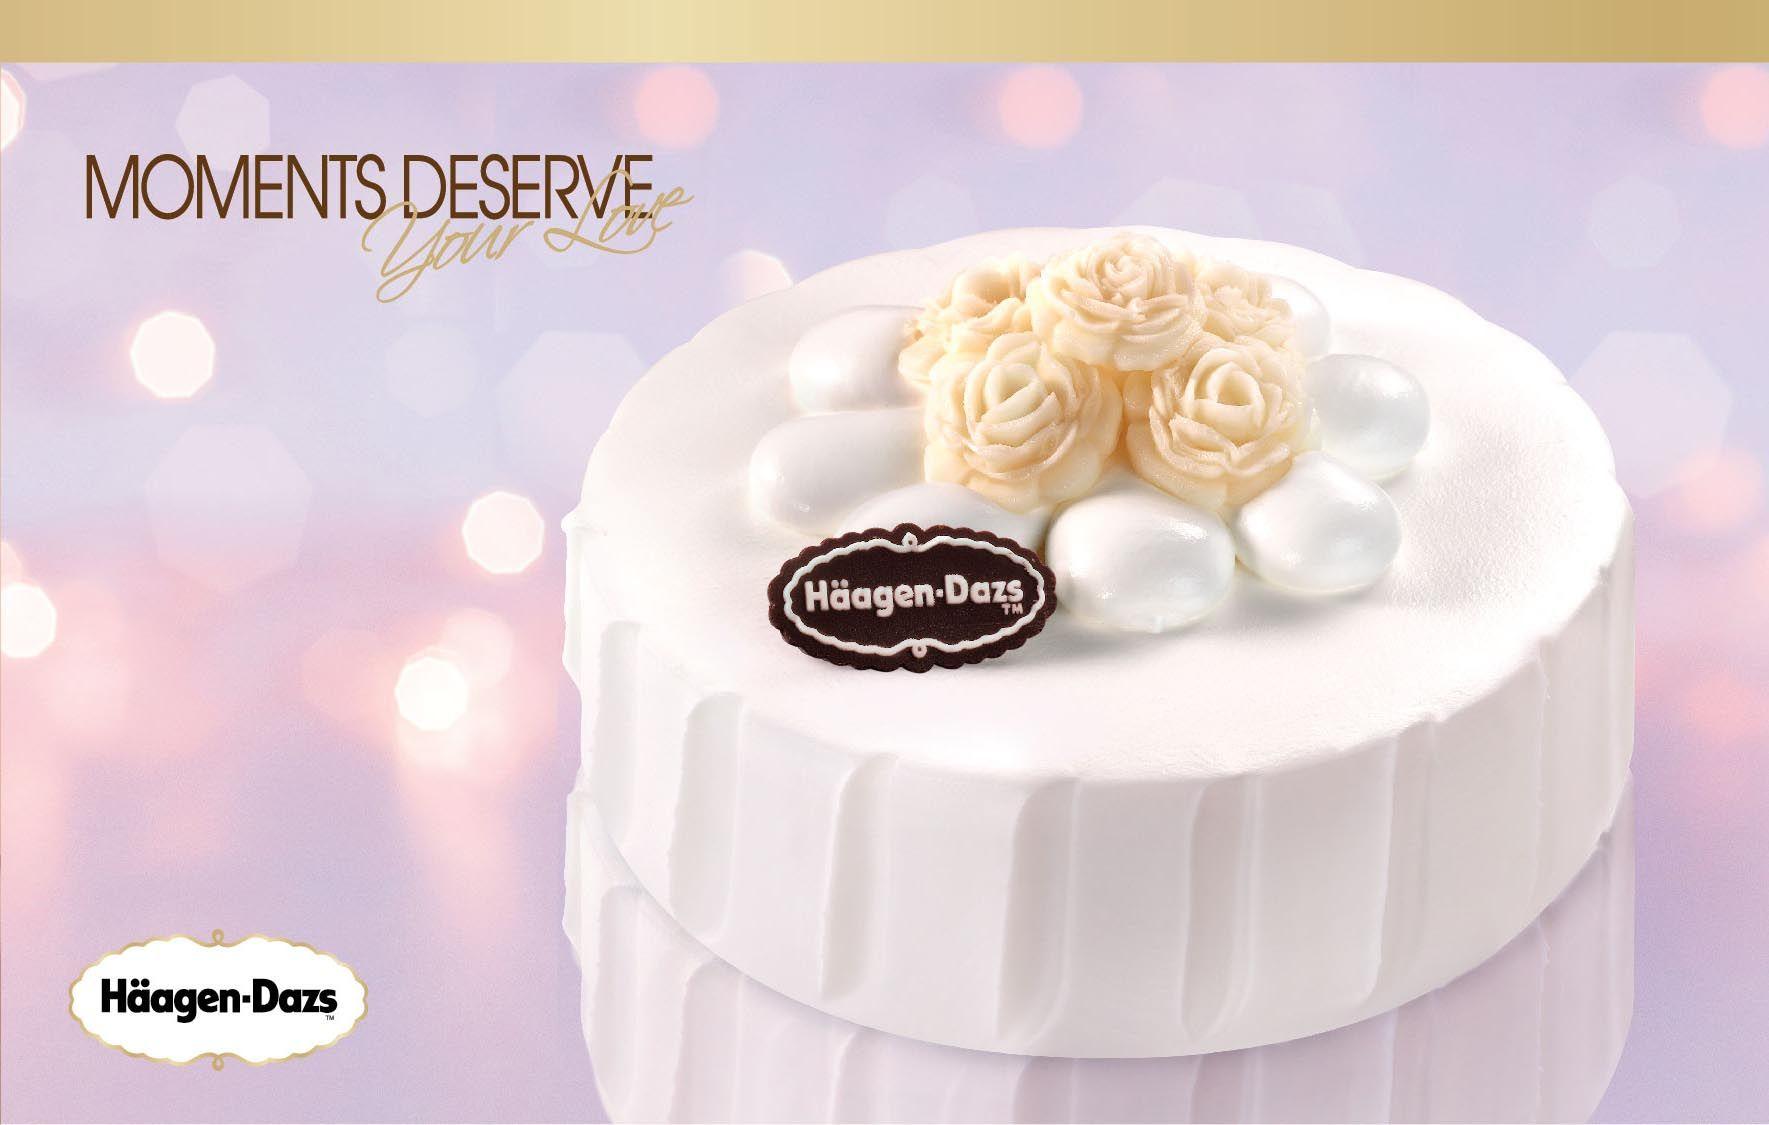 Haagendazs cake cake desserts birthday cake